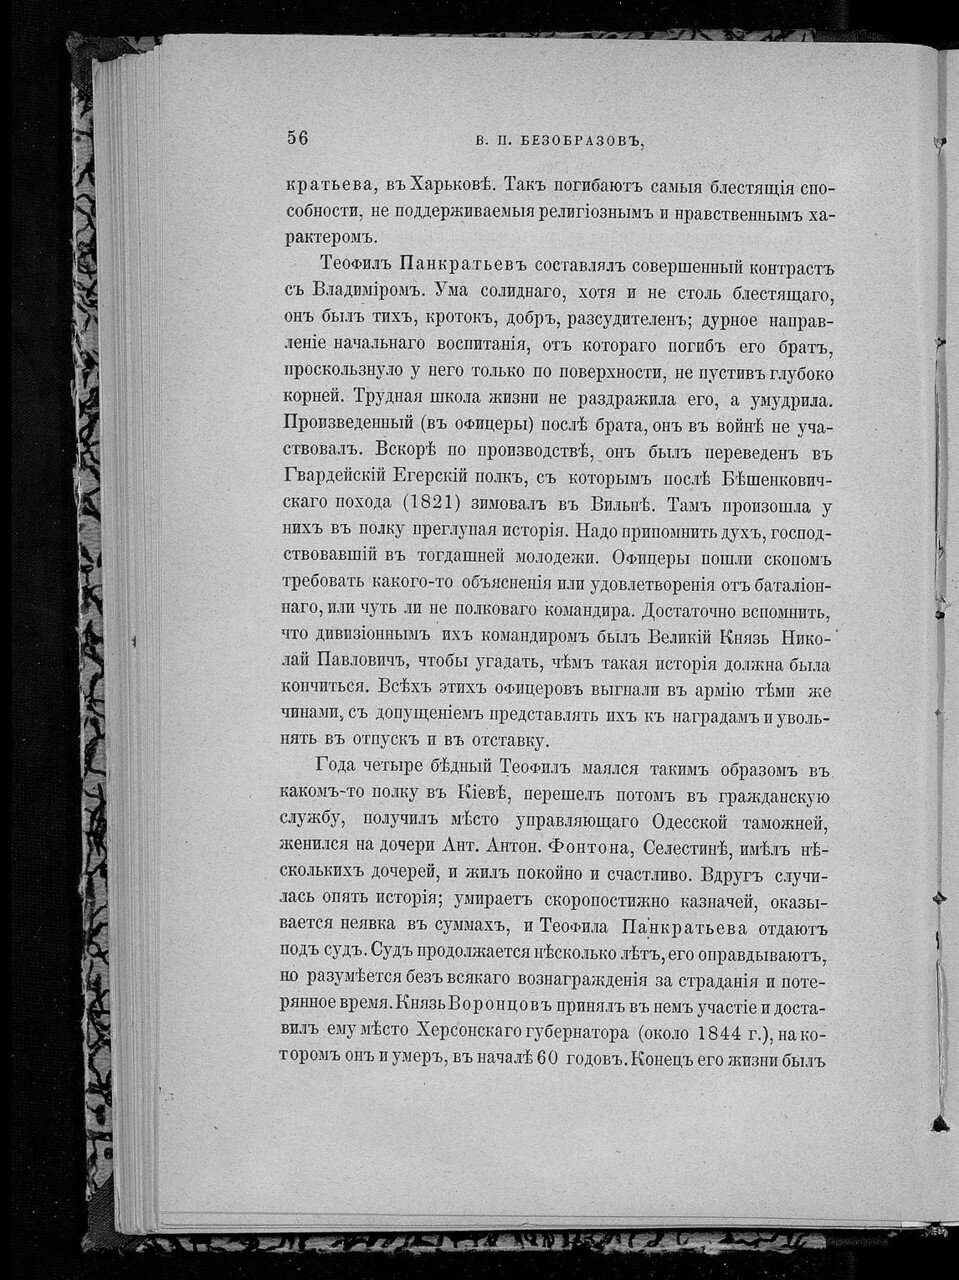 https://img-fotki.yandex.ru/get/893194/199368979.d4/0_21ddd7_b38b8f9a_XXXL.jpg